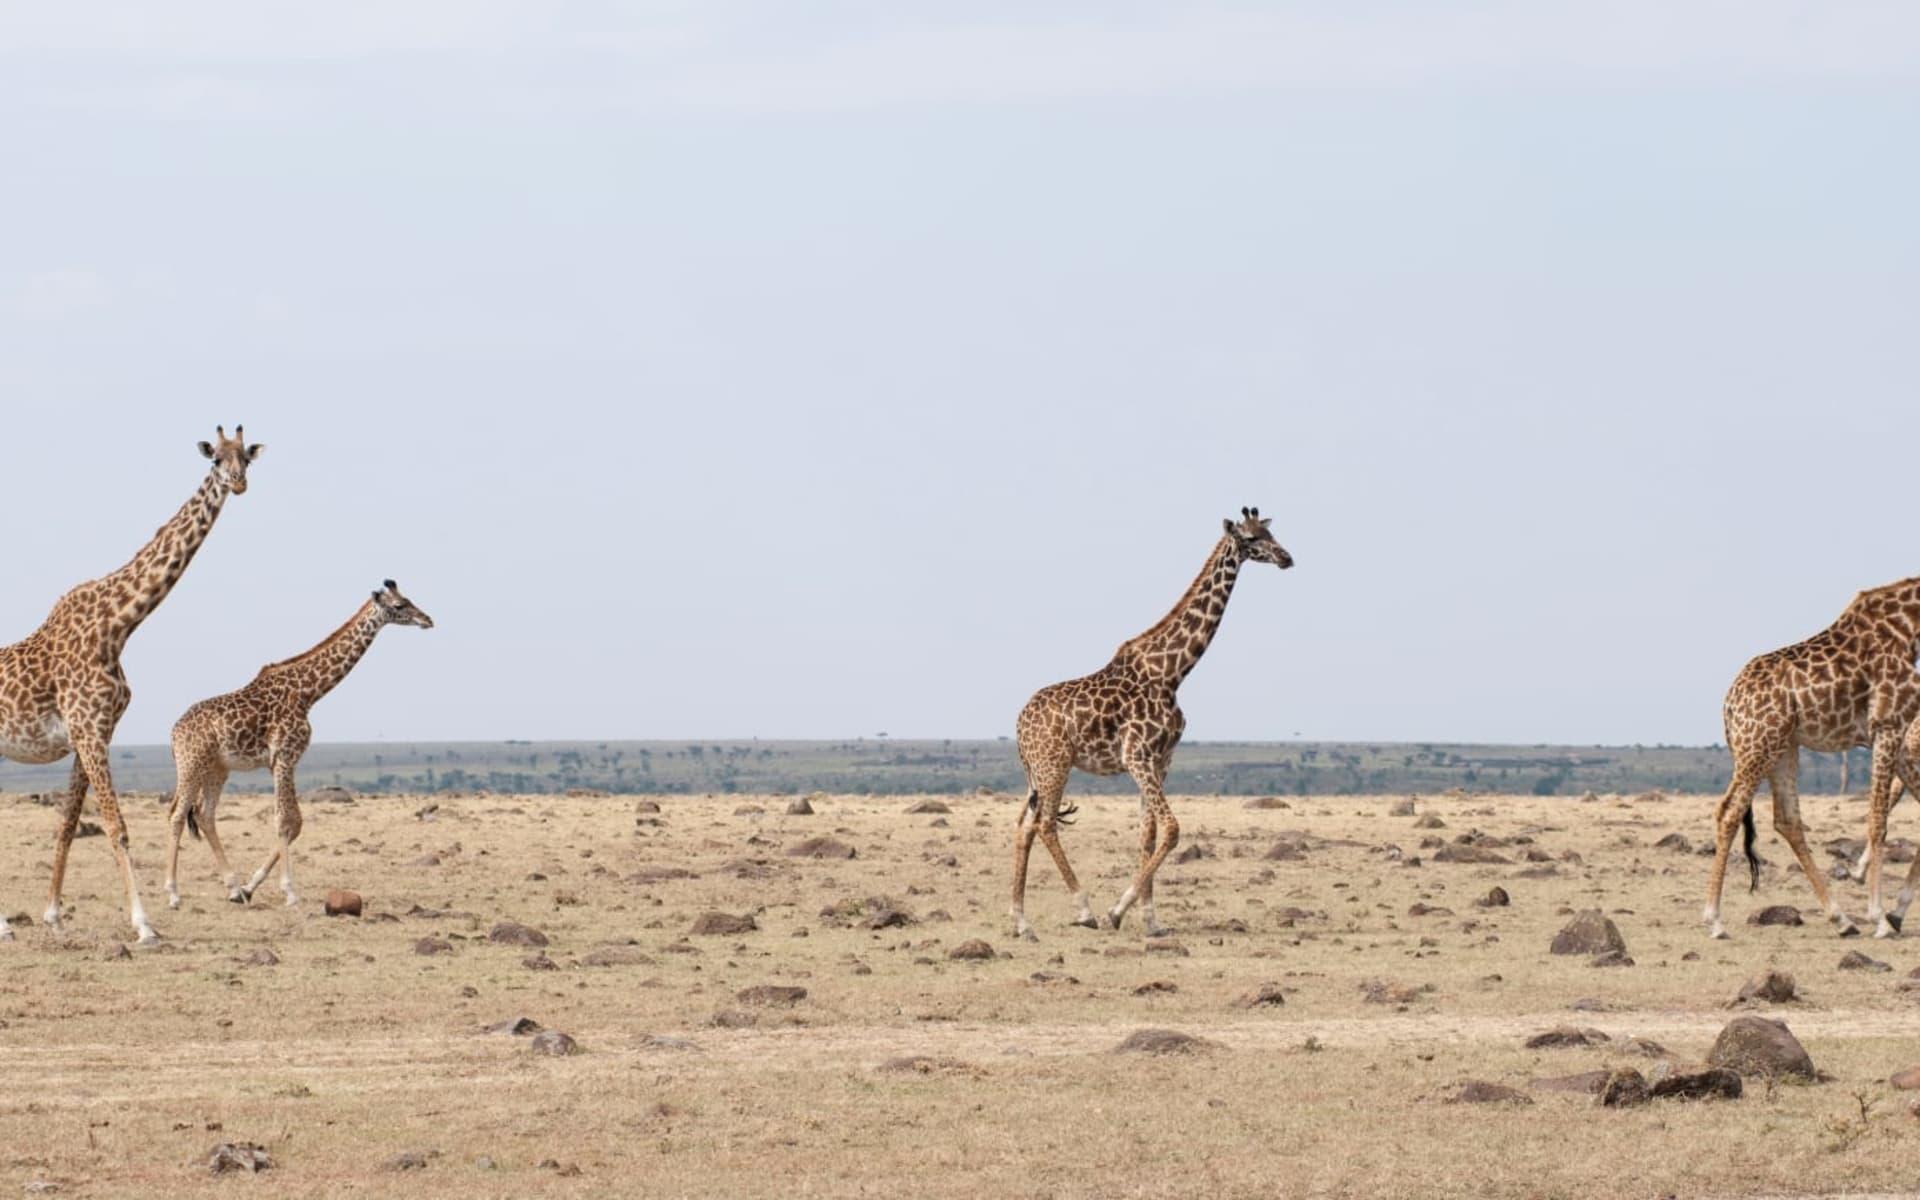 Höhepunkte Tanzania Safari (Flugvariante) ab Arusha: Giraffe Kenya